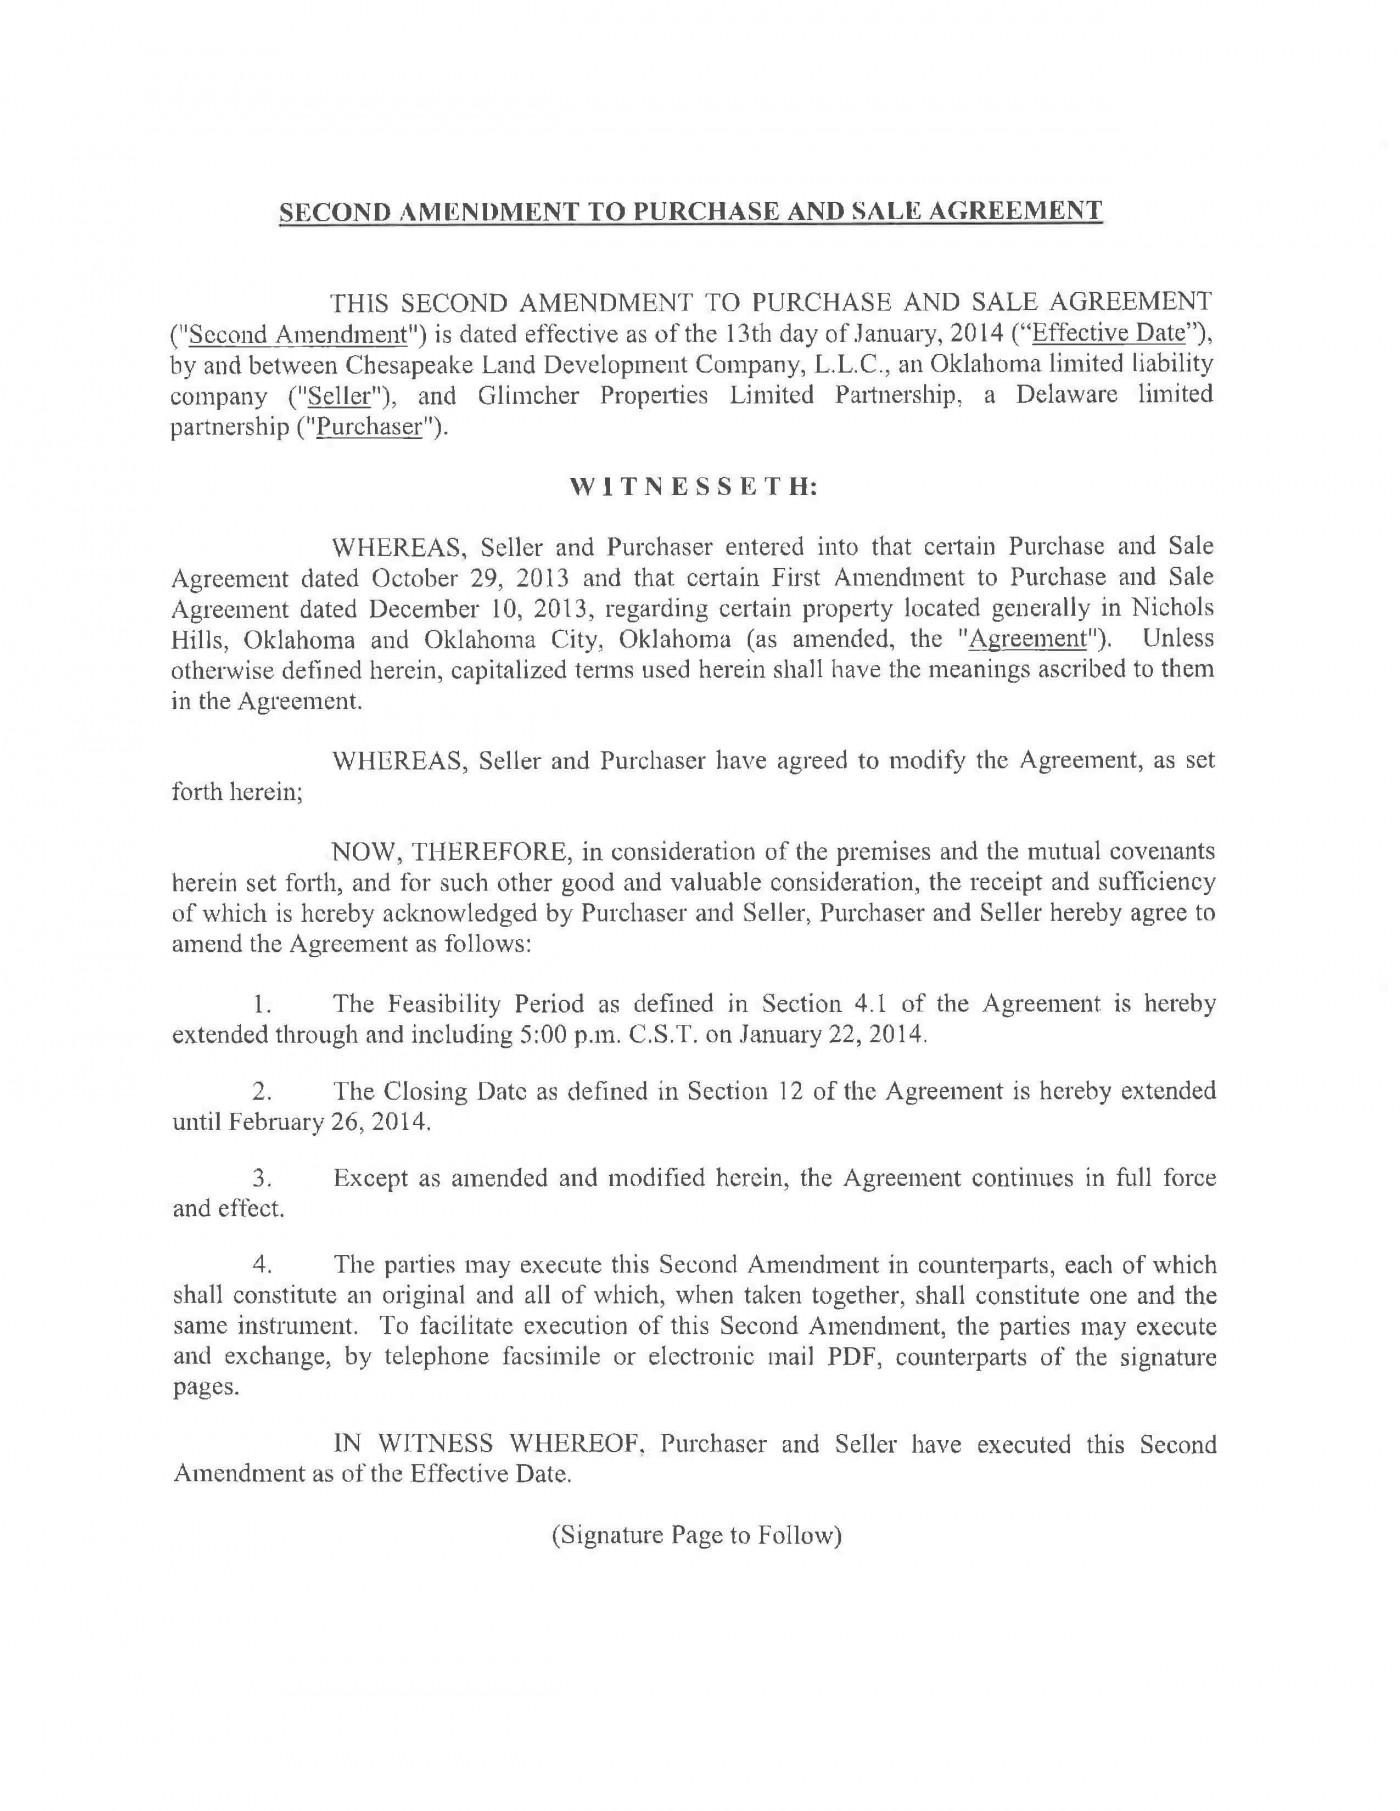 007 Stupendou Buy Sell Agreement Llc Sample Example 1400